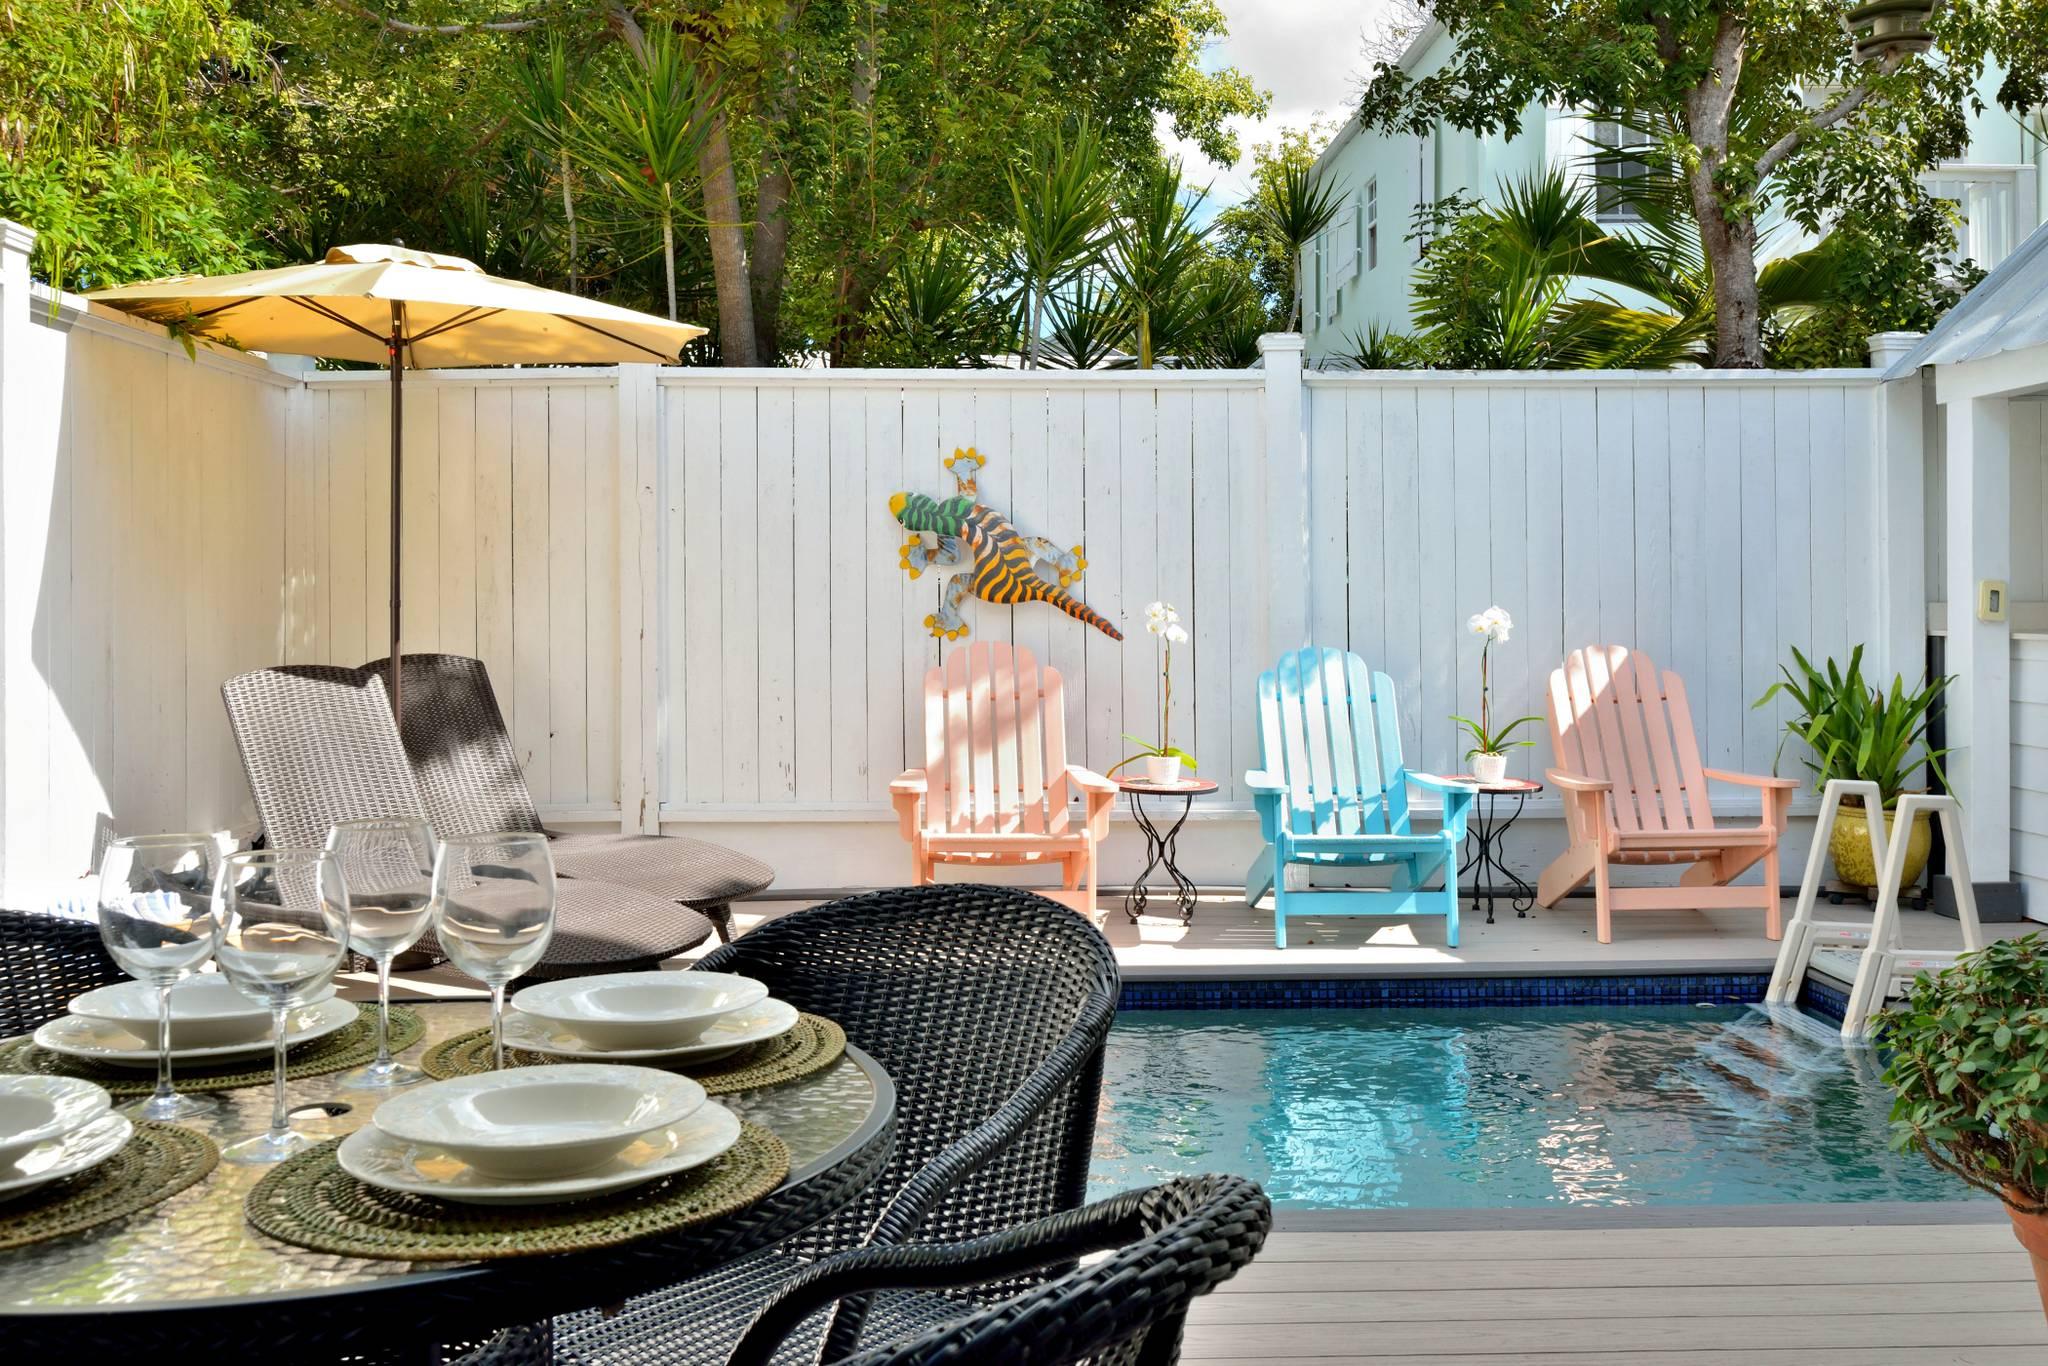 Phenomenal Potters Cottage Nightly Rental Historic Key West Interior Design Ideas Gentotryabchikinfo